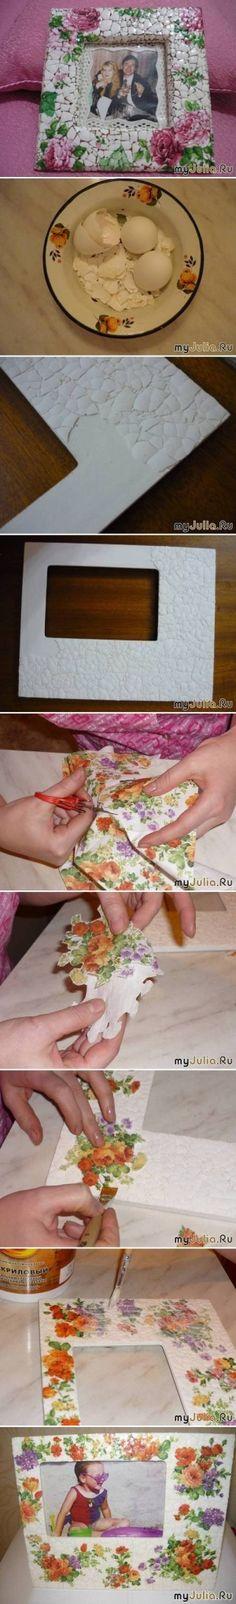 DIY Eggshell Mosaic Picture Frame DIY Eggshell Mosaic Picture Frame by diyforever